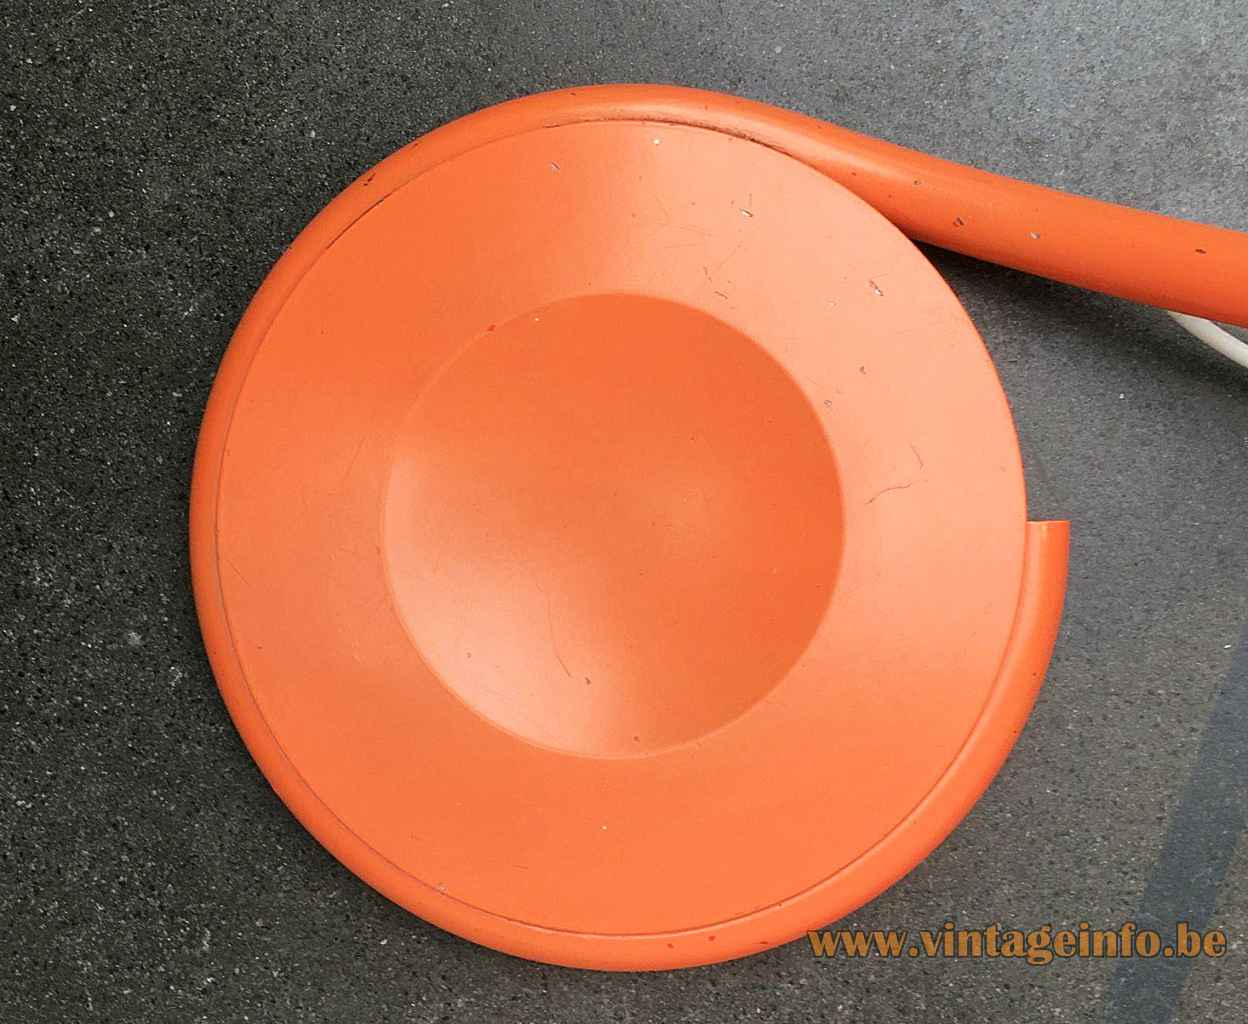 Martinelli Luce Serpente floor lamp round orange metal base 1965 design: Elio Martinelli Italy